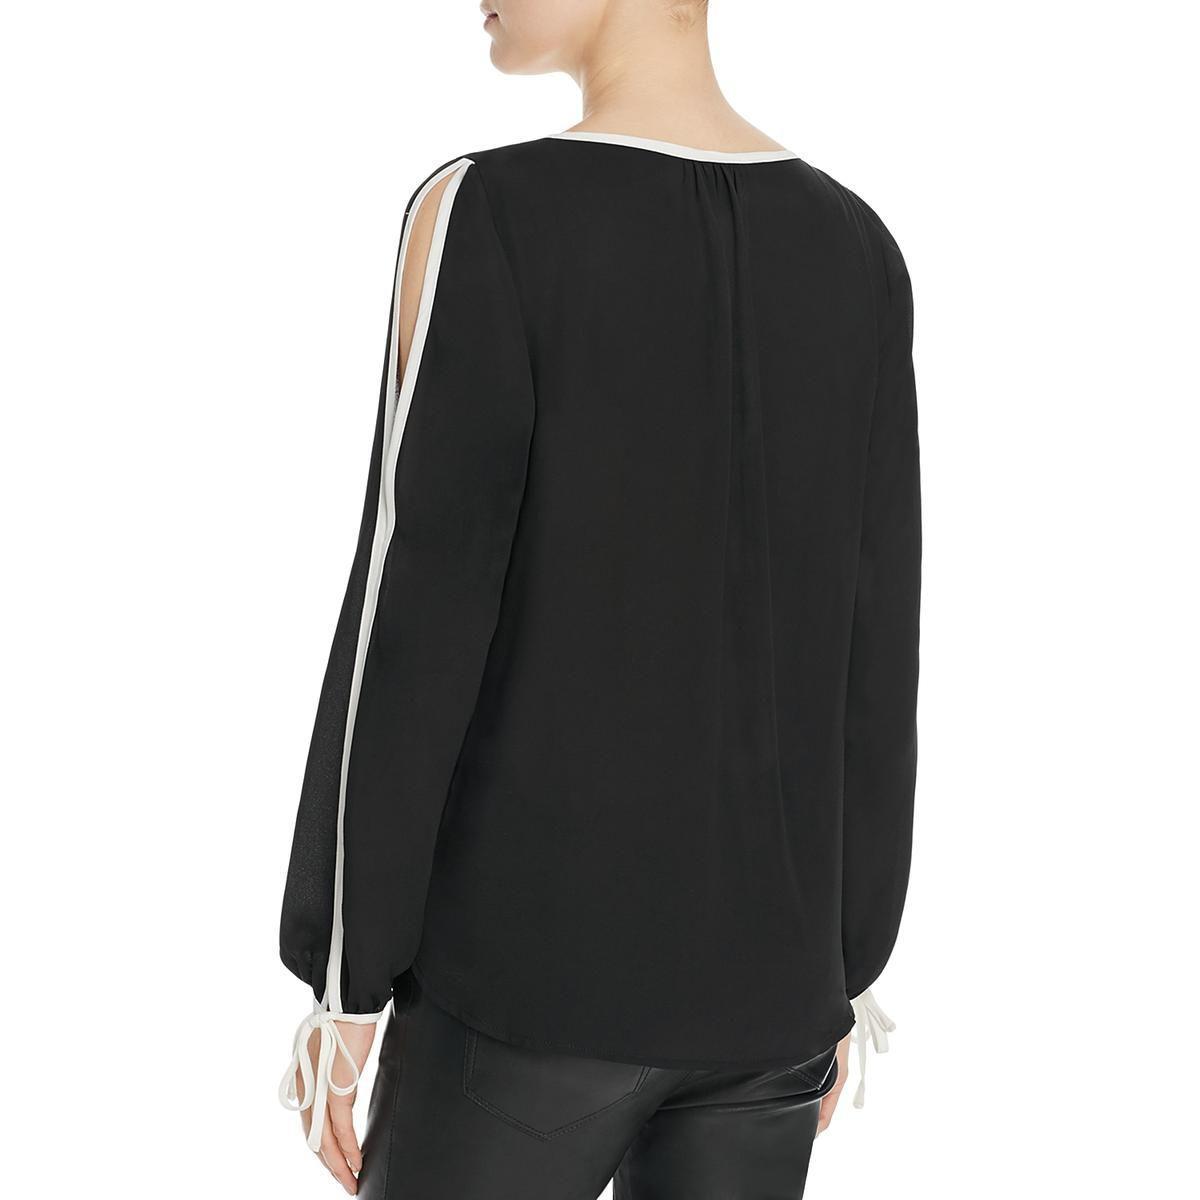 fa43617ffa070a Bobeau - Black Womens Denver Contrast Trim Cold Shoulder Blouse - Lyst.  View fullscreen